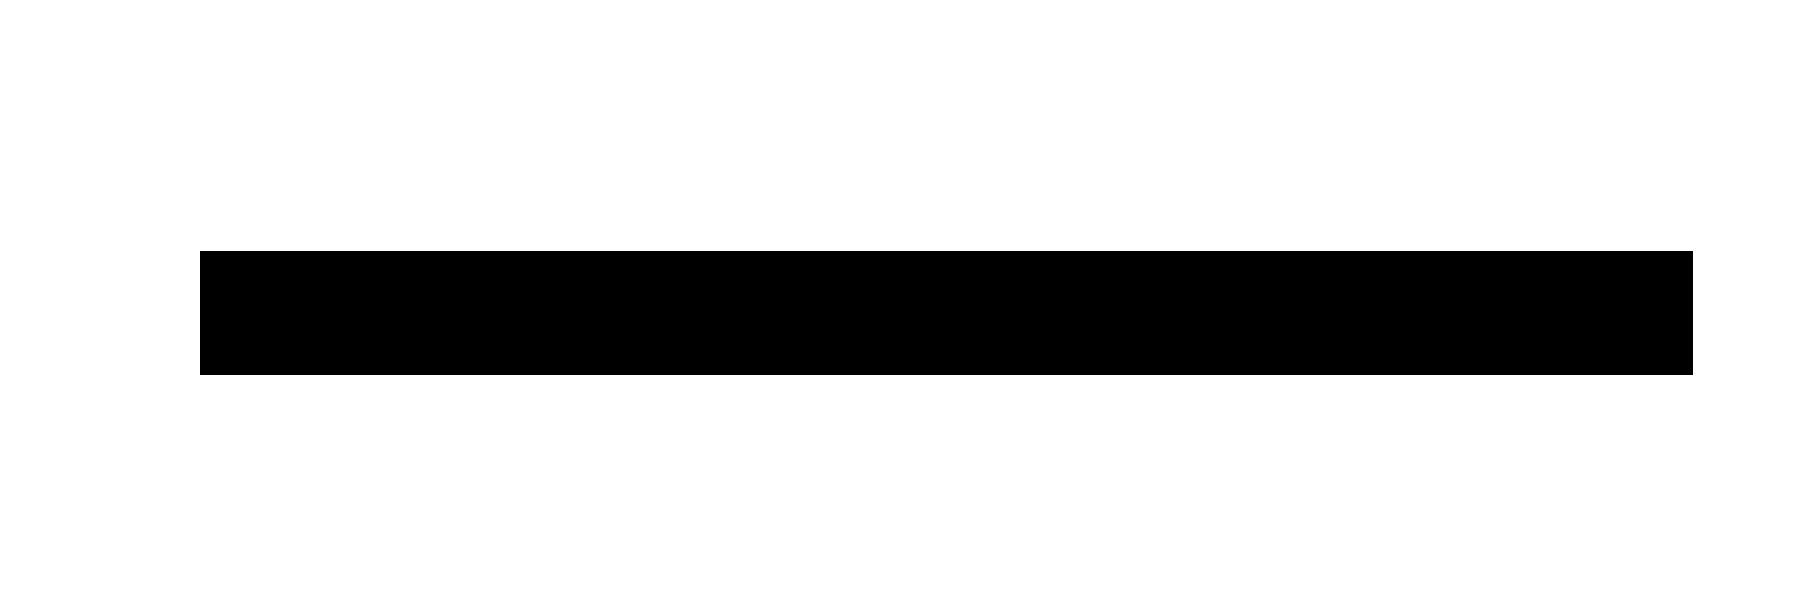 01_SunsetStudios_Logos_04B